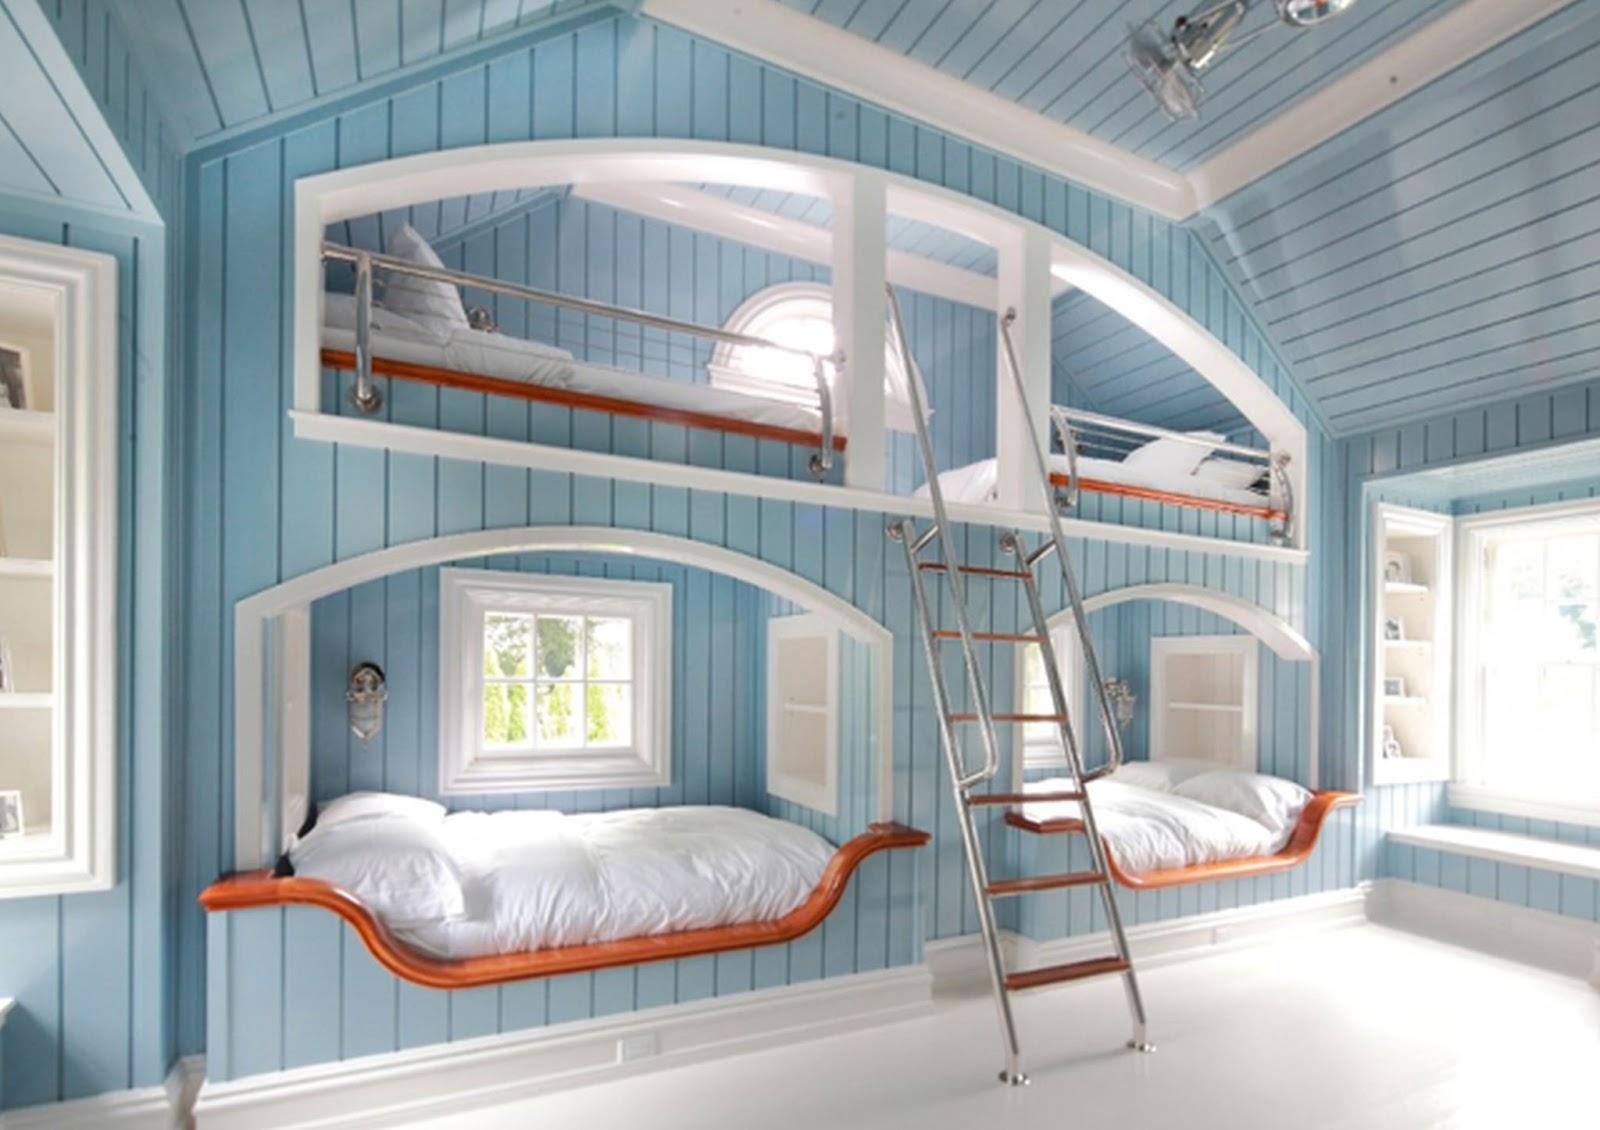 3. Bedroom Idea For 4 Girls